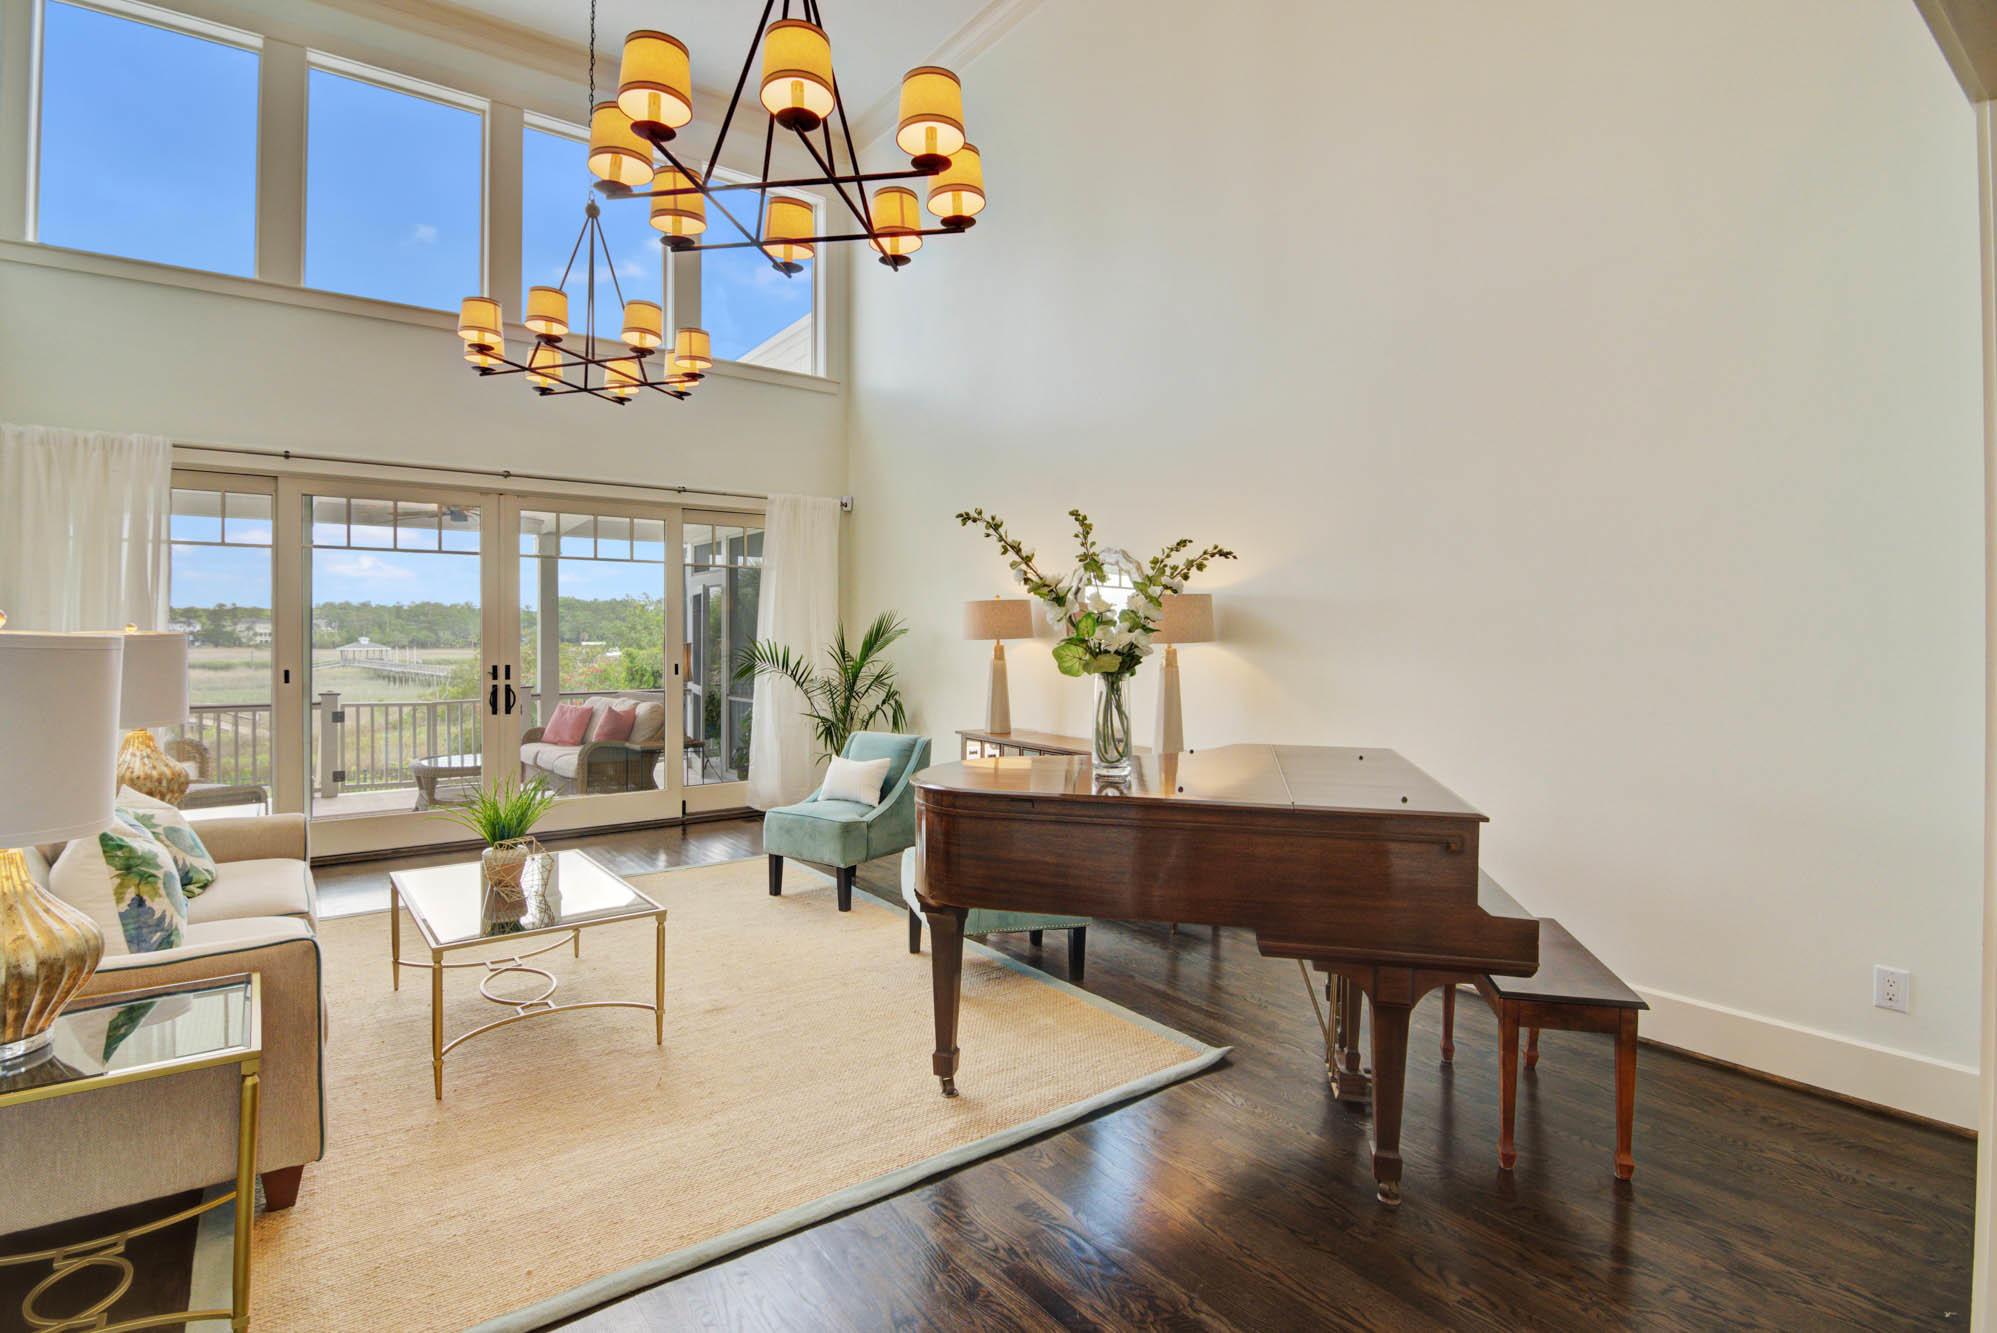 Brickyard Plantation Homes For Sale - 2682 Egrets Landing, Mount Pleasant, SC - 53